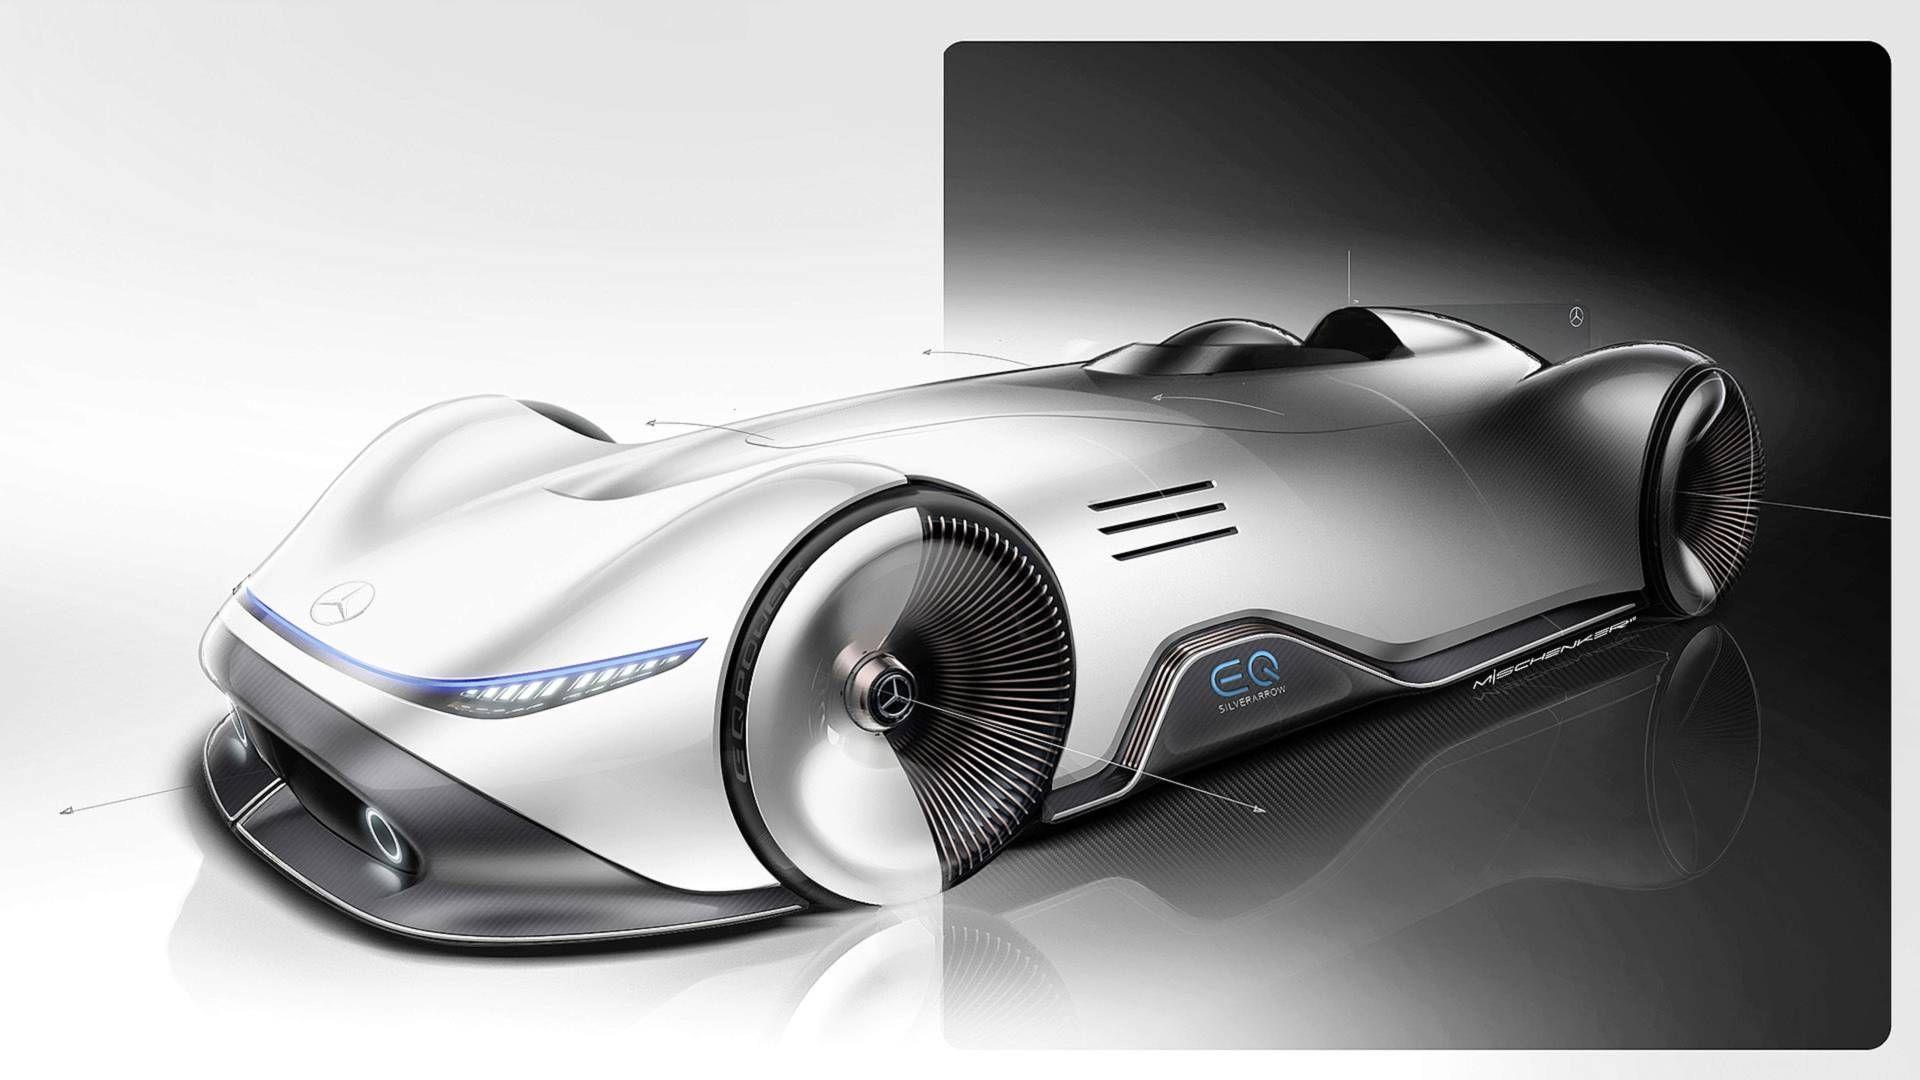 Mercedes Benz Eq Silver Arrow Evokes The Past With Future Tech Carscoops Concept Car Design Concept Cars Benz